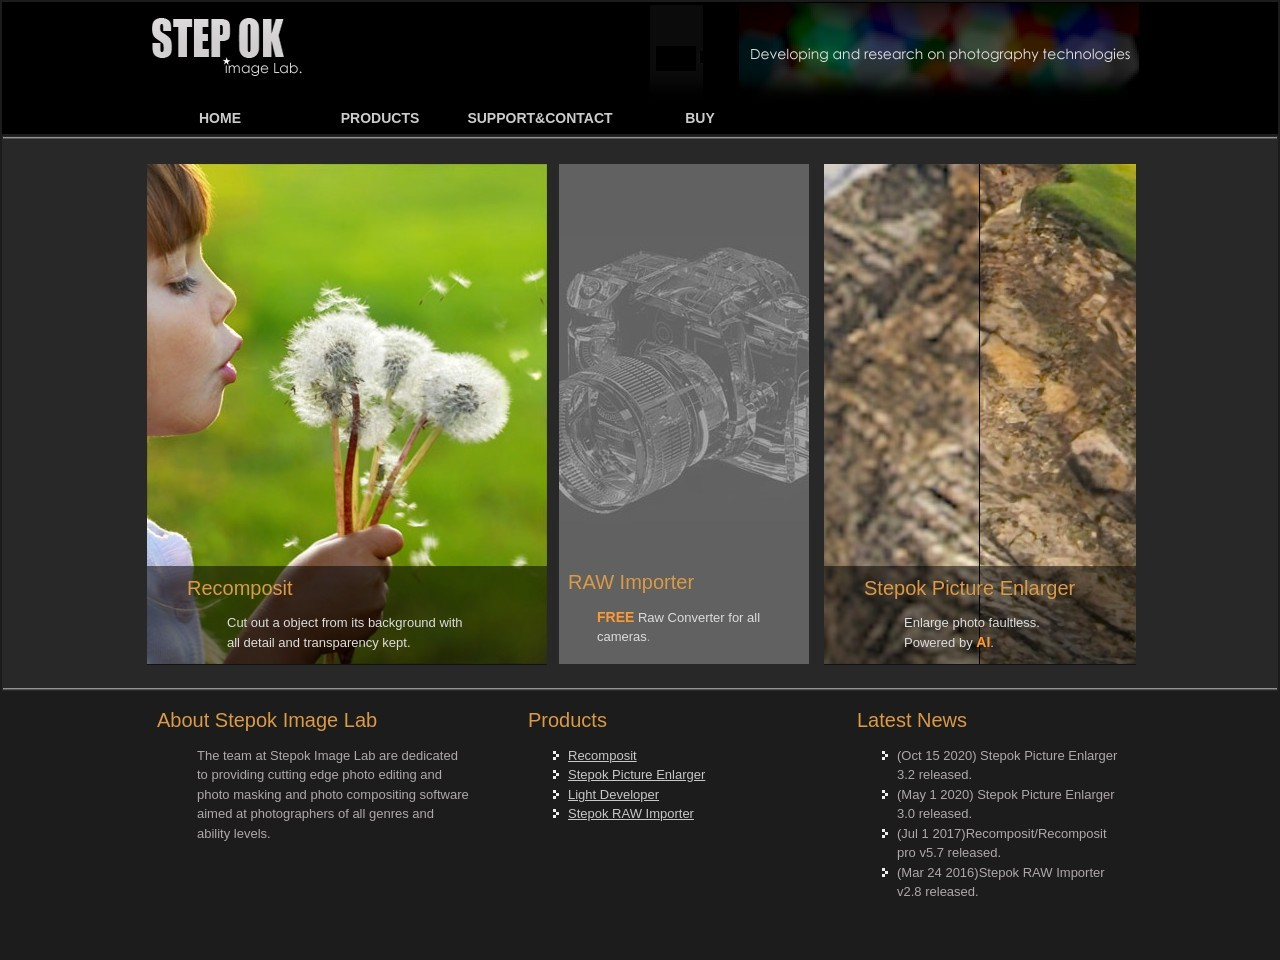 Stepok Image Lab.